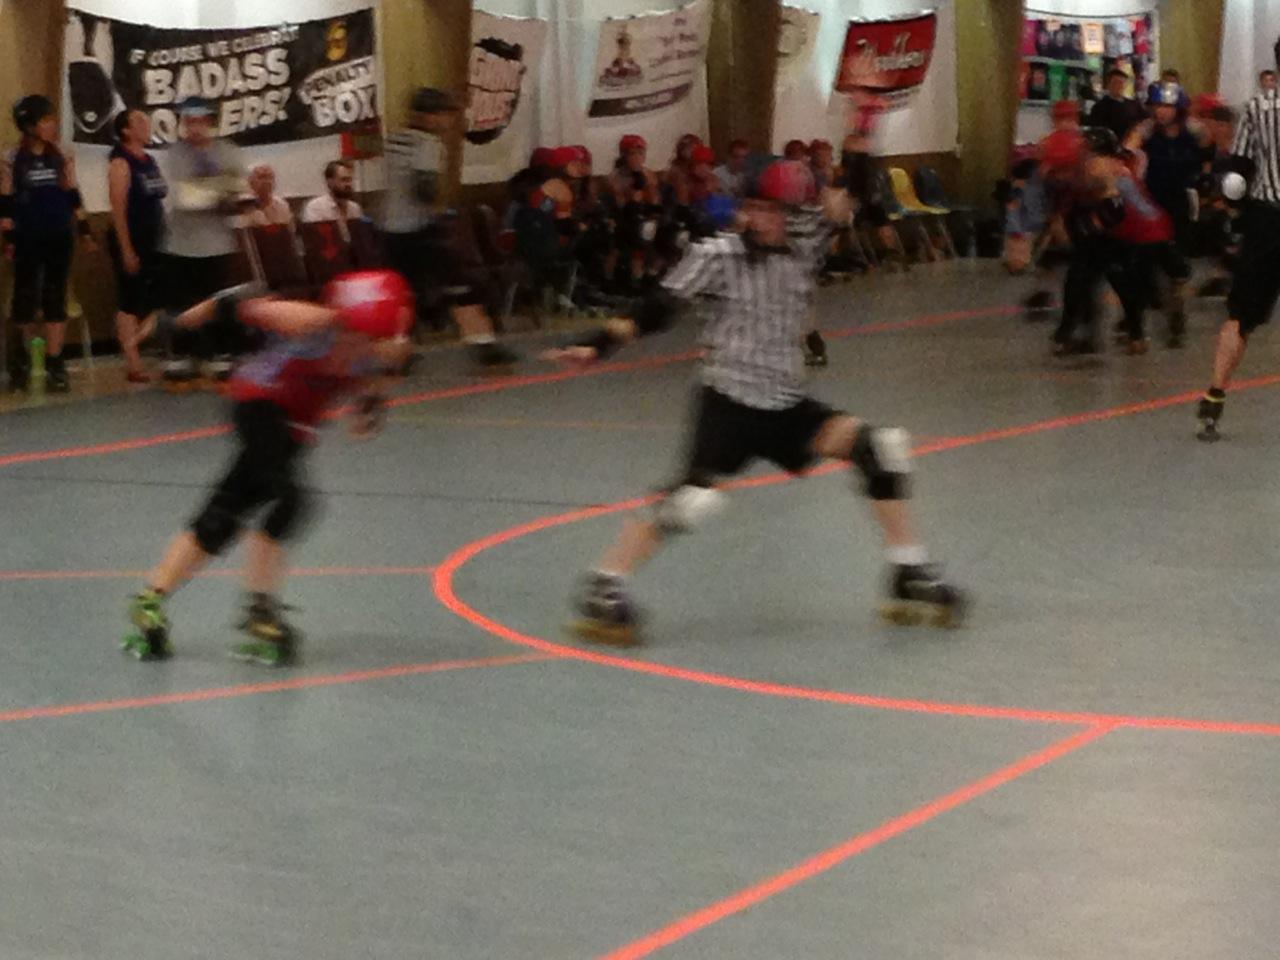 Jammer and ref roller derby